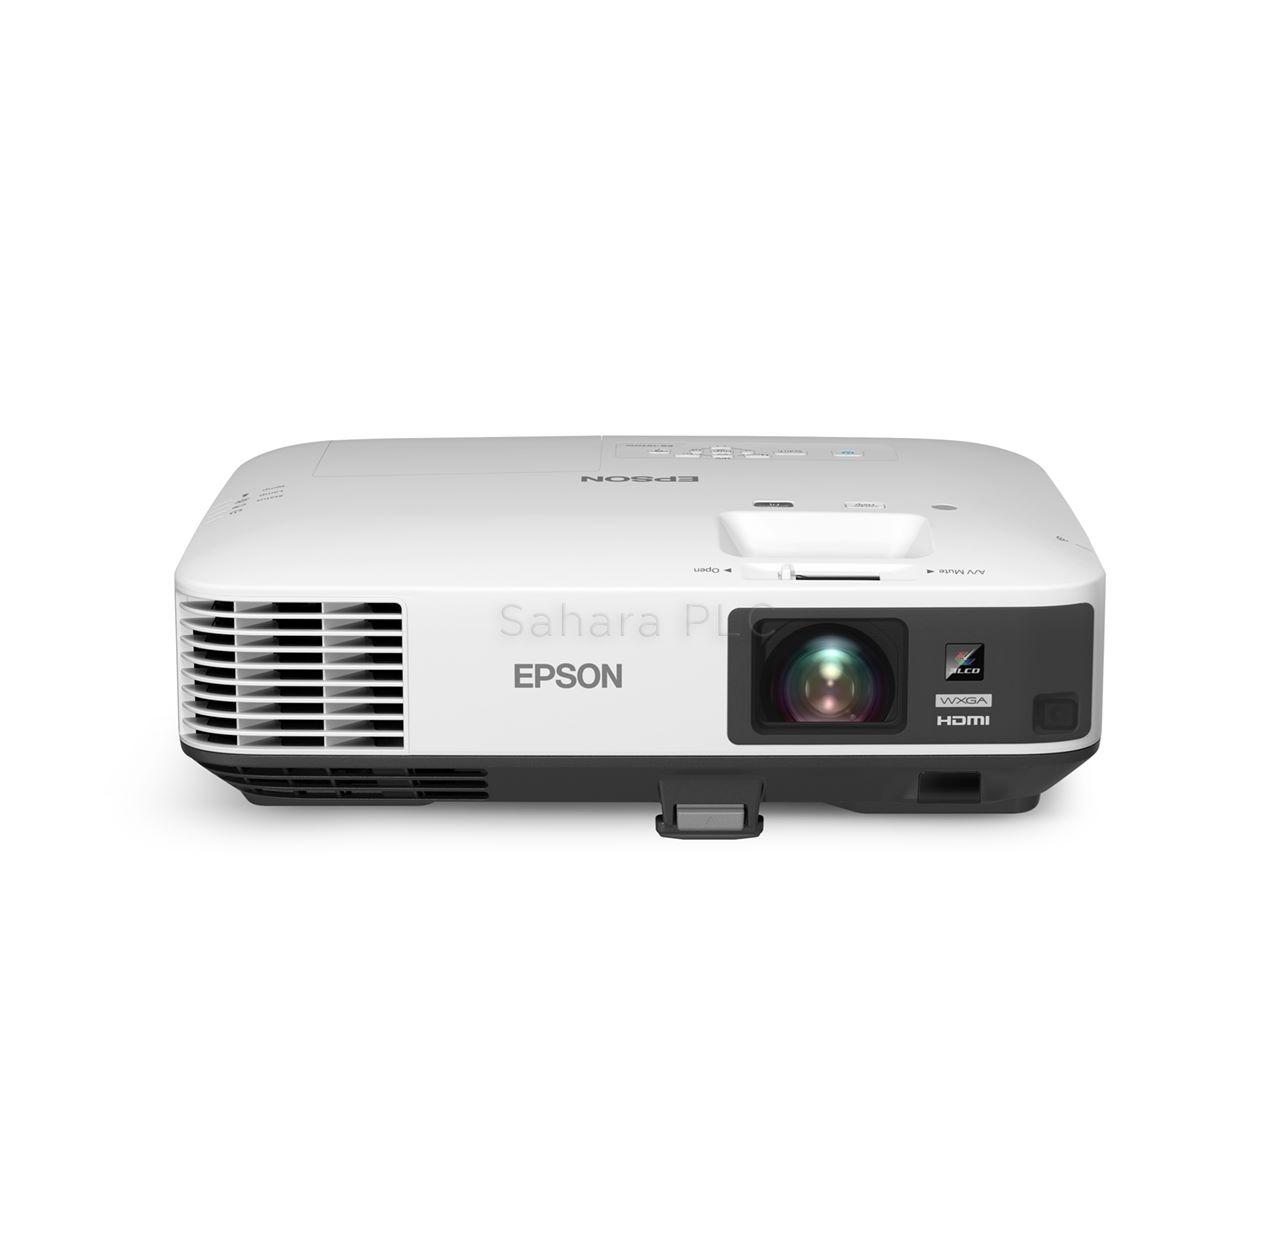 Epson eb 1970w projector sahara presentation systems plc for Epson document projector